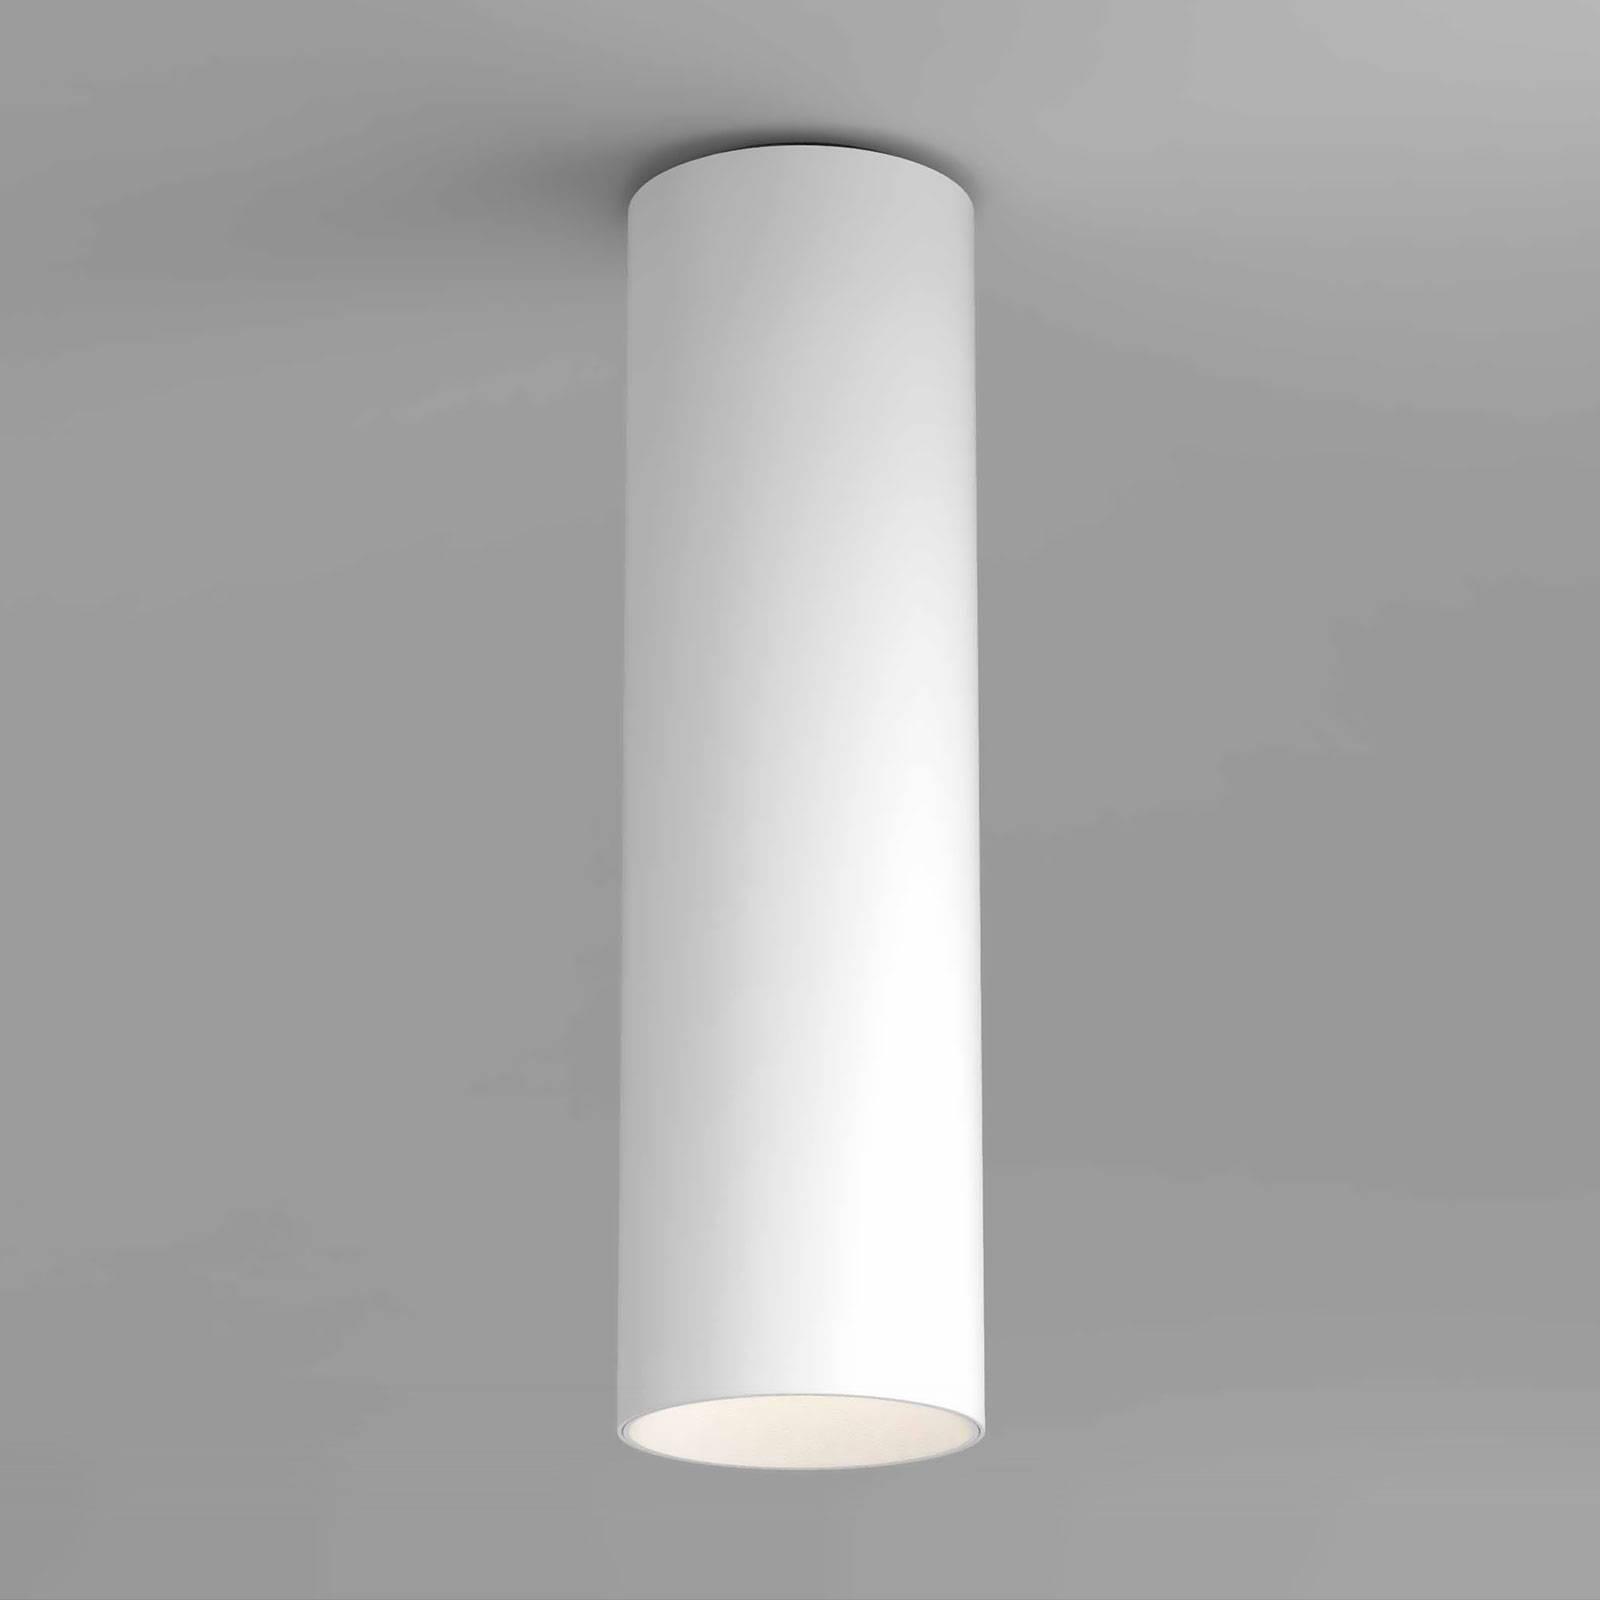 Astro Yuma Surface lampa sufitowa LED biała matowa